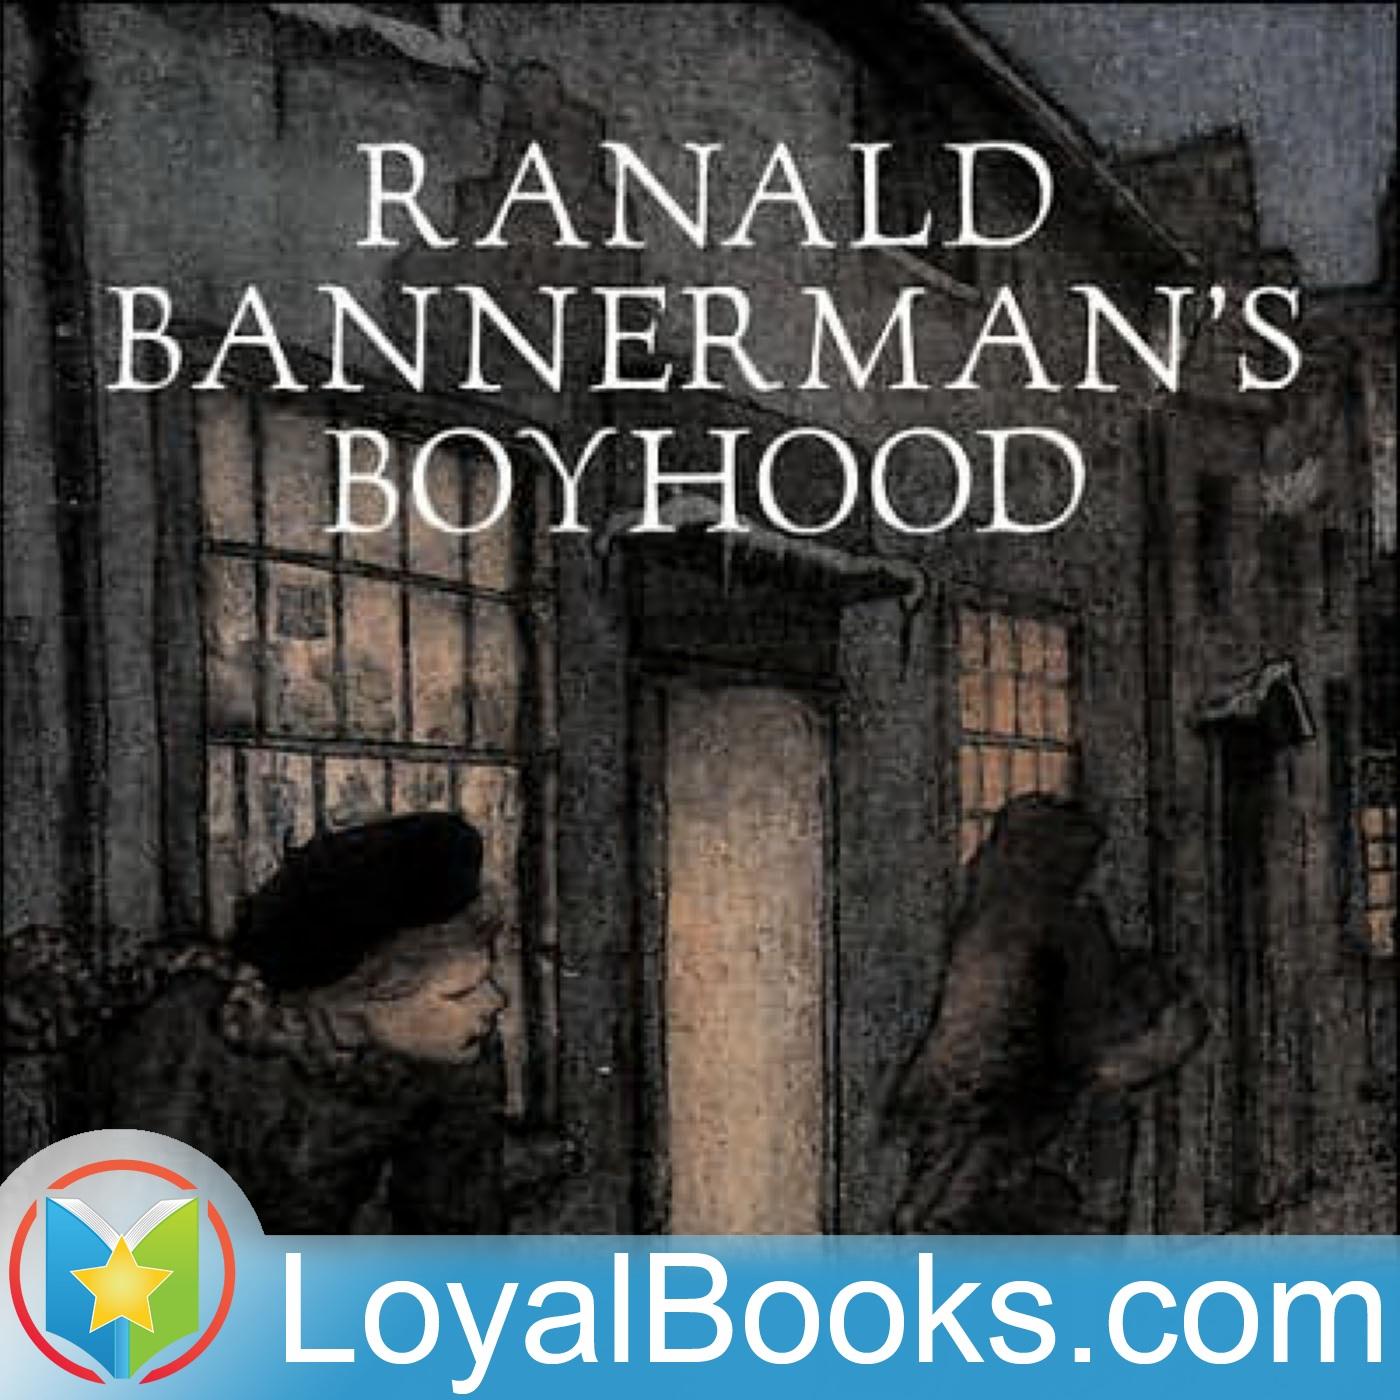 <![CDATA[Ranald Bannerman's Boyhood by George MacDonald]]>